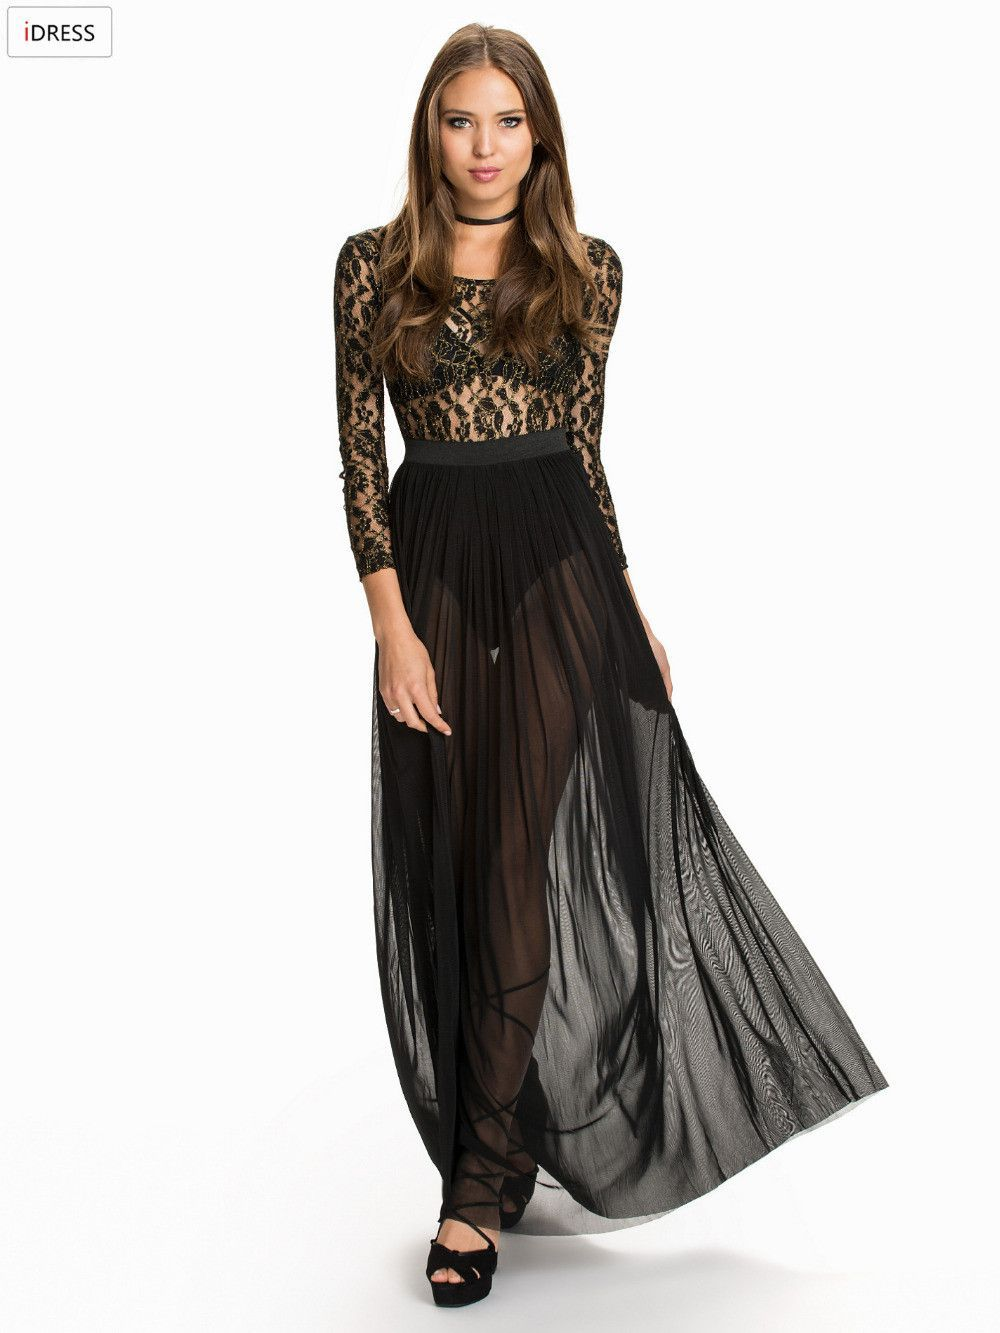 Idress women black long dress gold flower lace long sleeve party